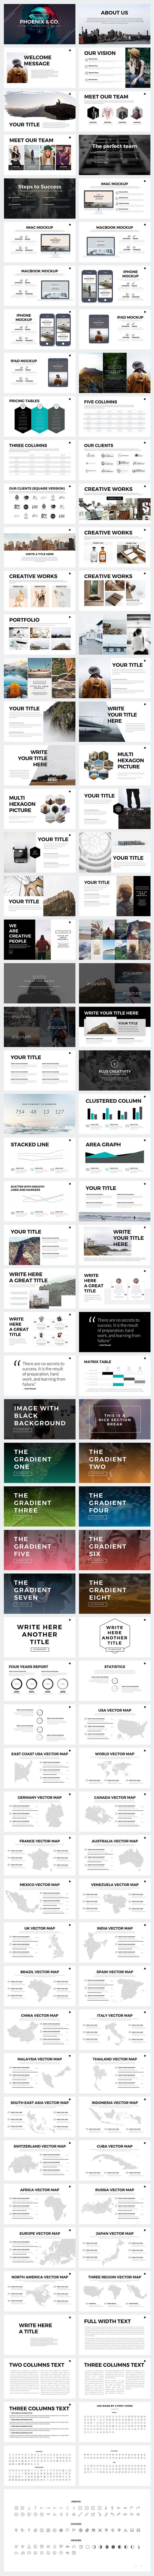 Best Minimal Keynote Presentation Templates Images On